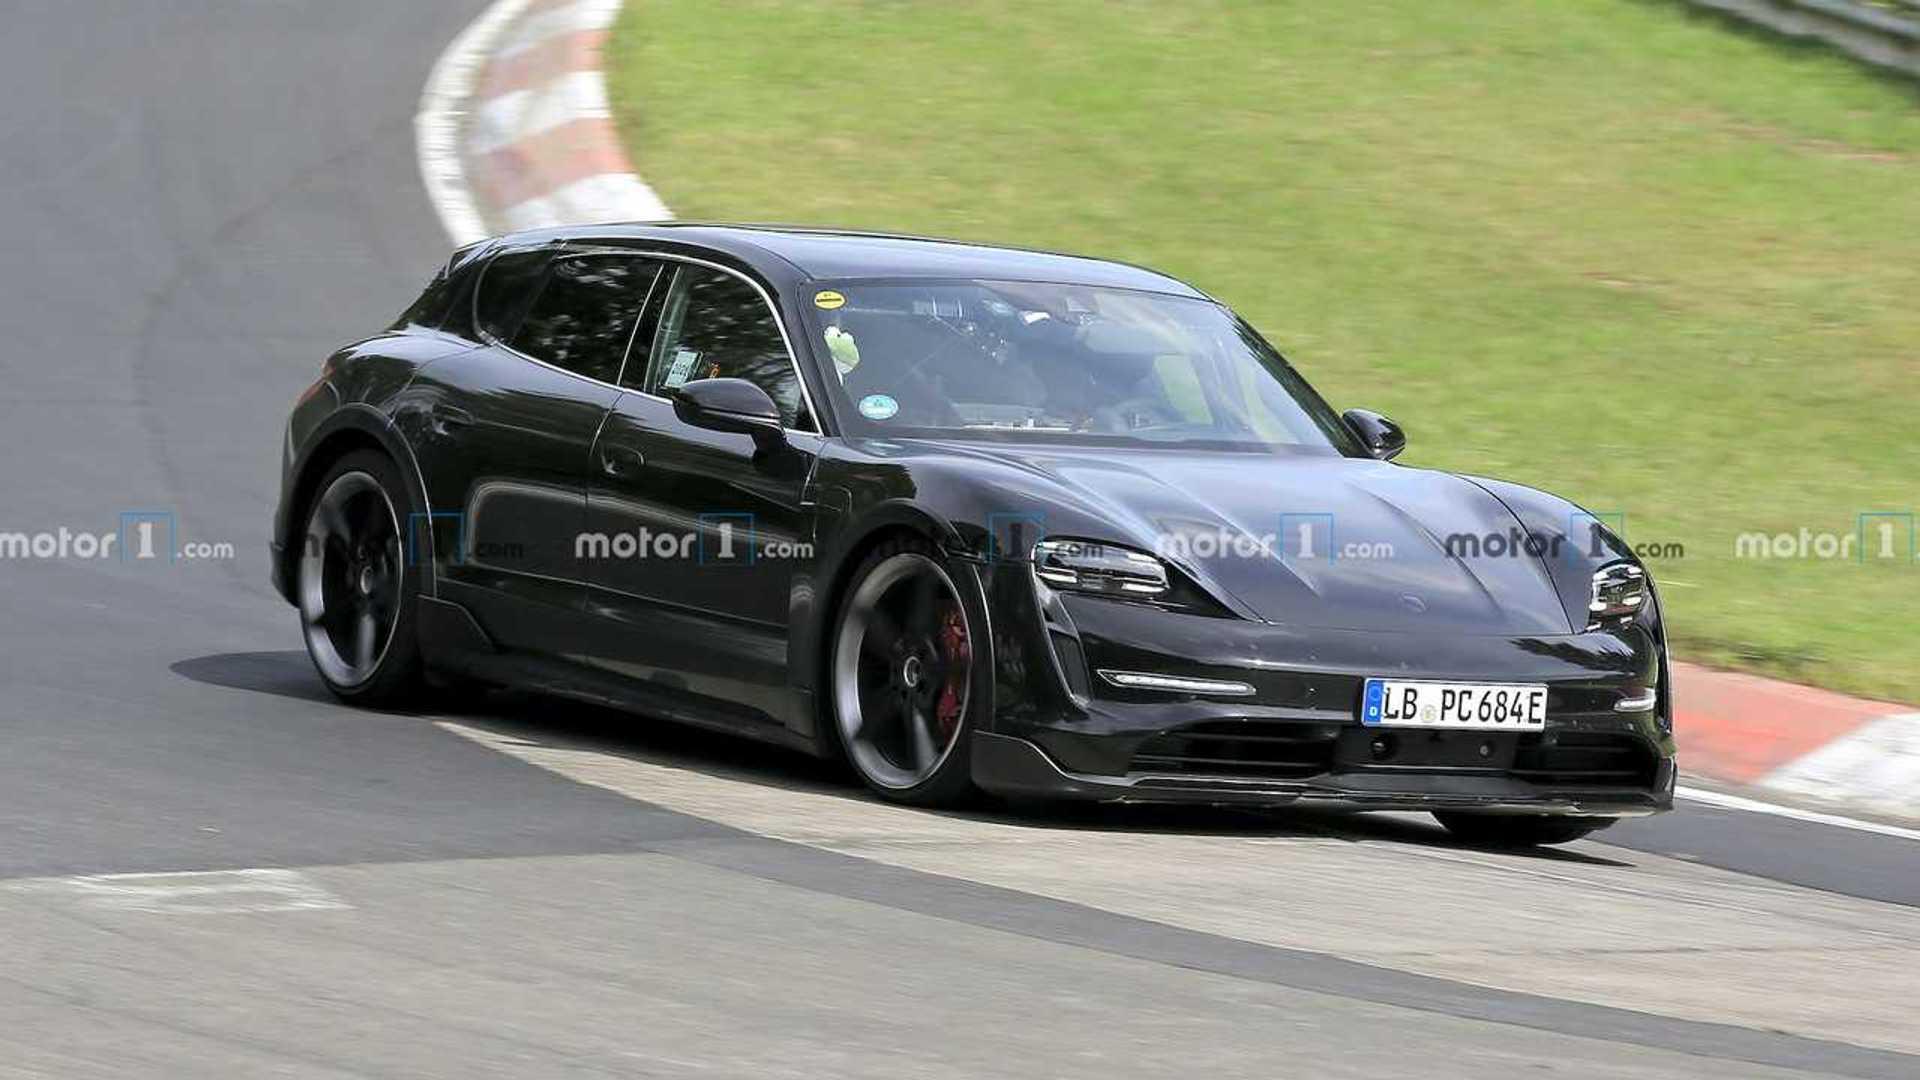 2020 - [Porsche] Taycan Sport Turismo - Page 2 Porsche-taycan-cross-turismo-spied-at-nurburgring-front-running